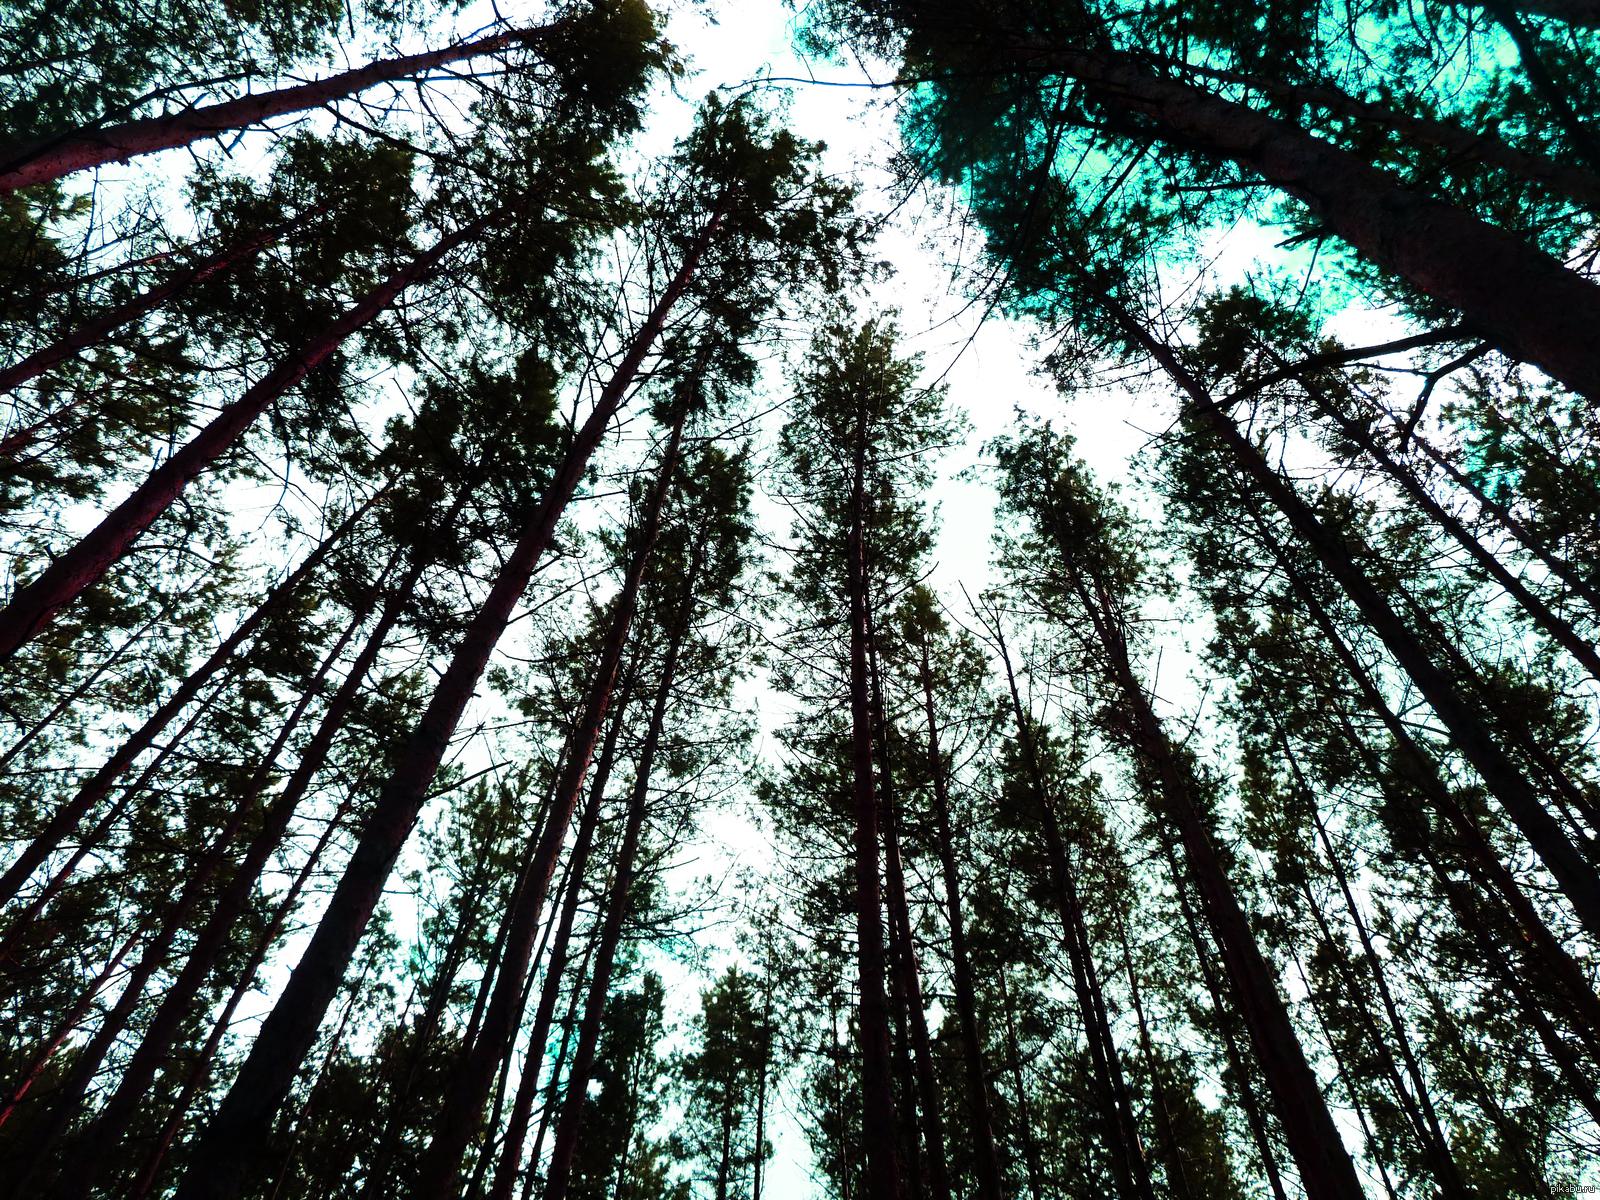 никто лес самара картинки можно наносить старые